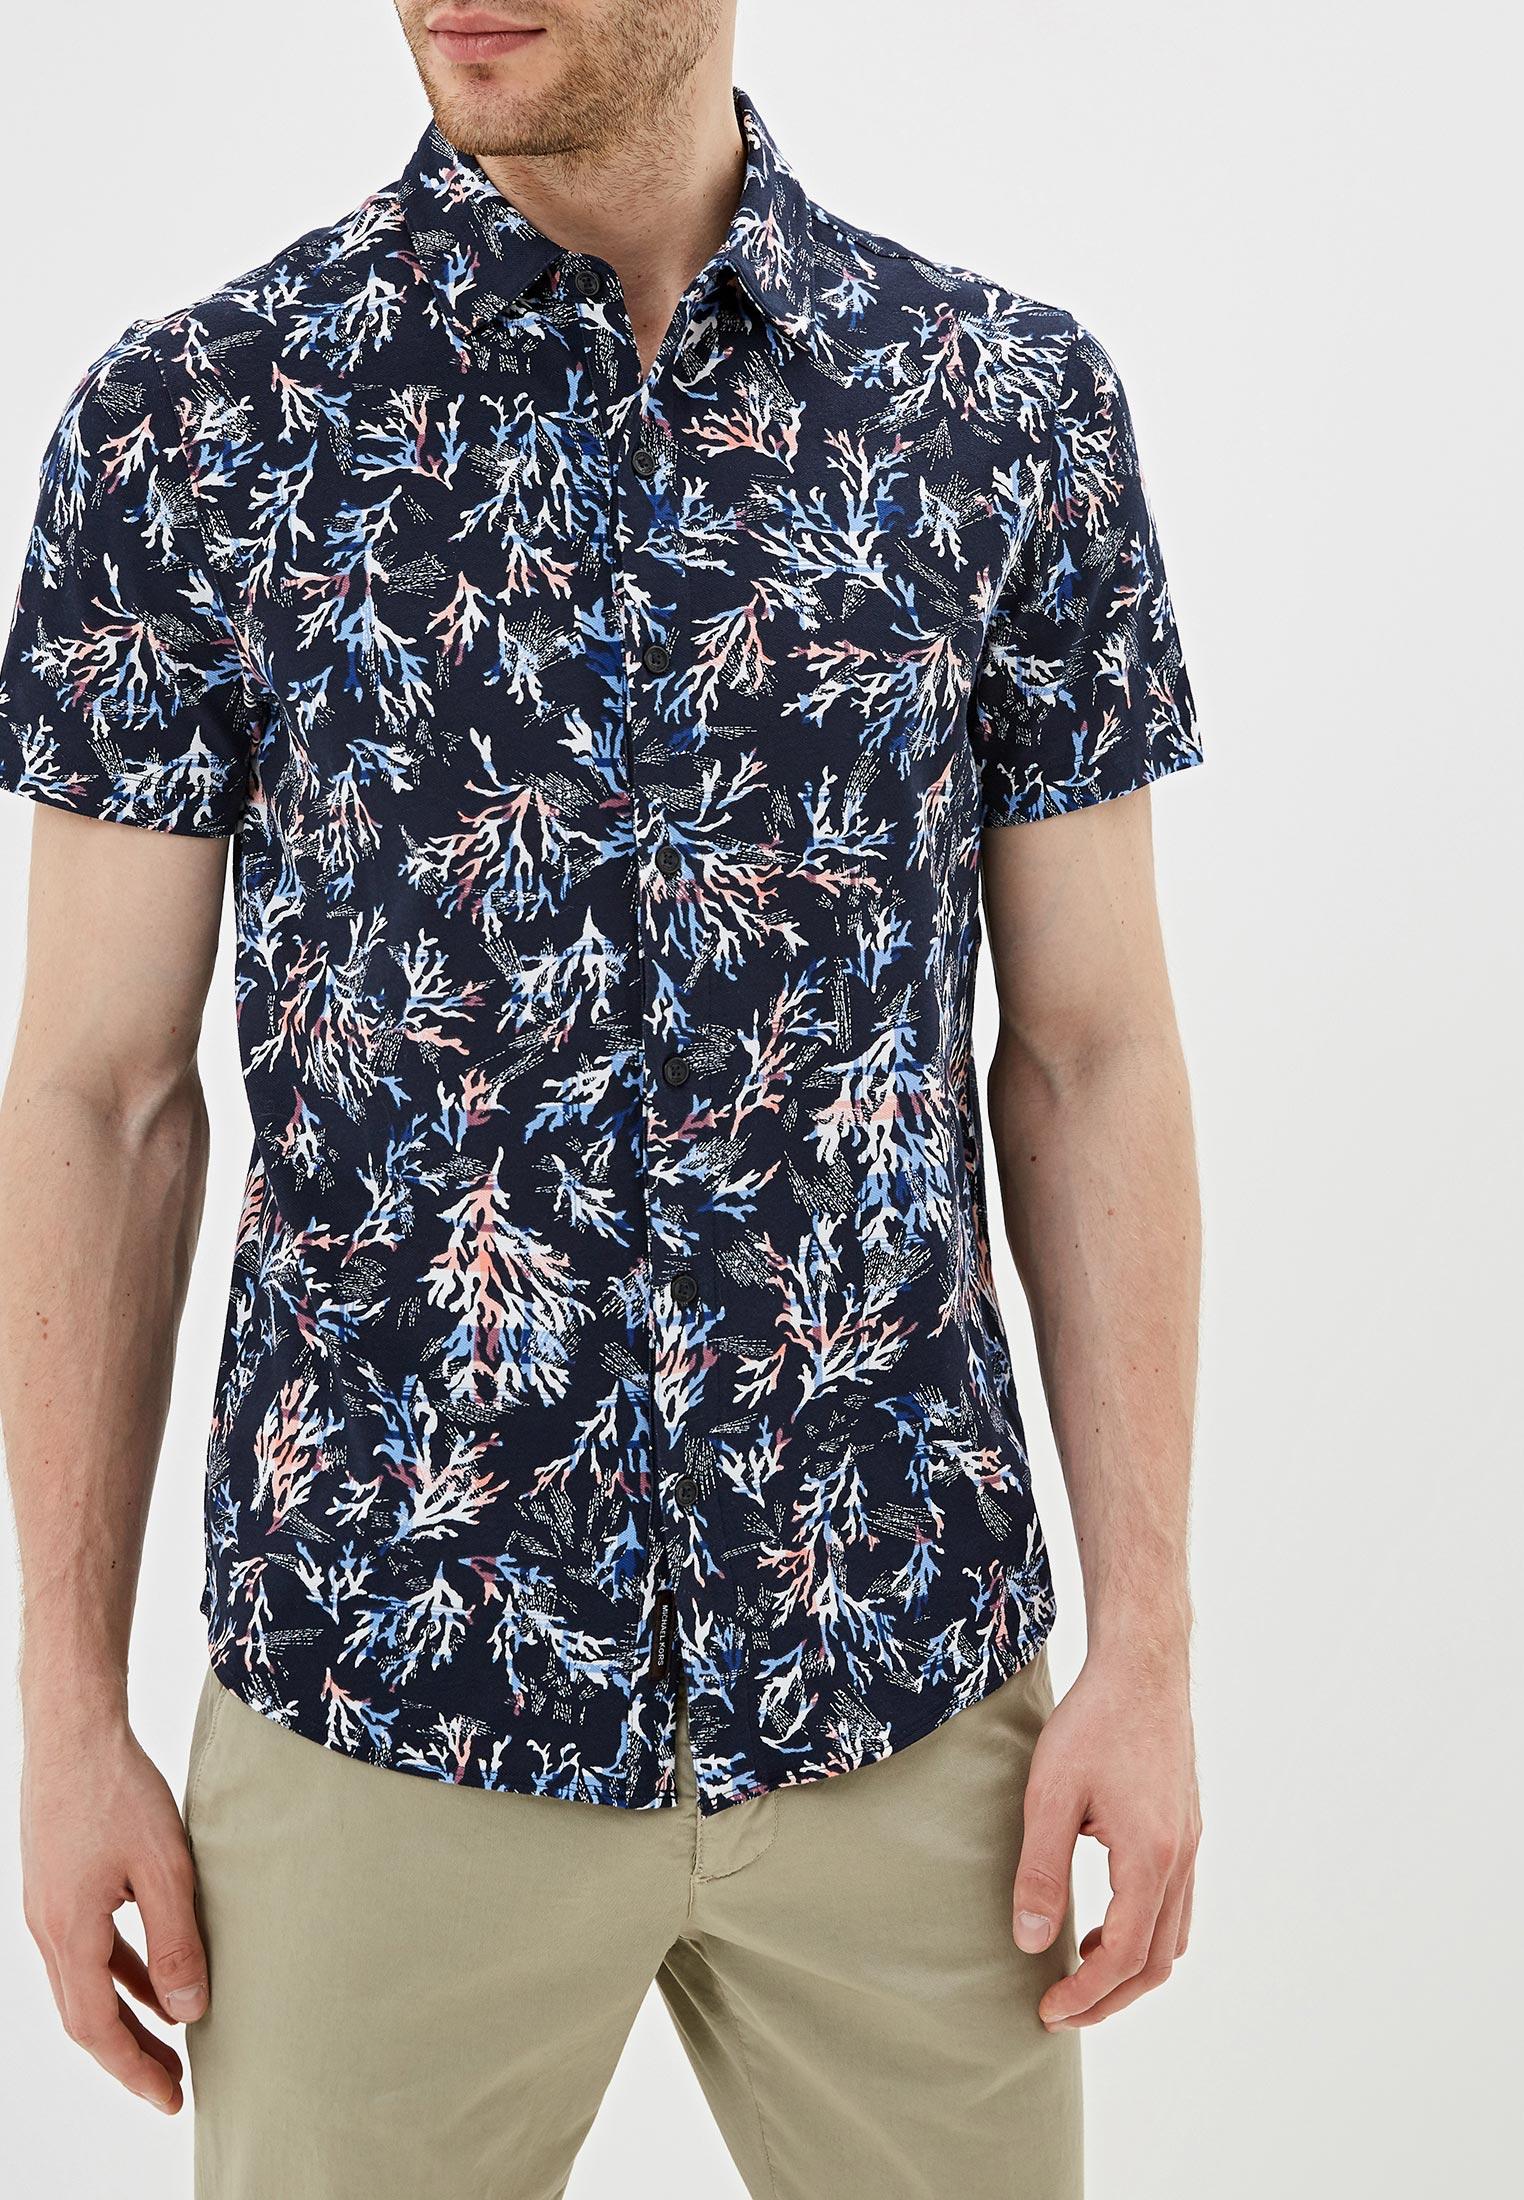 Рубашка с коротким рукавом Michael Kors cu95h9j6rh